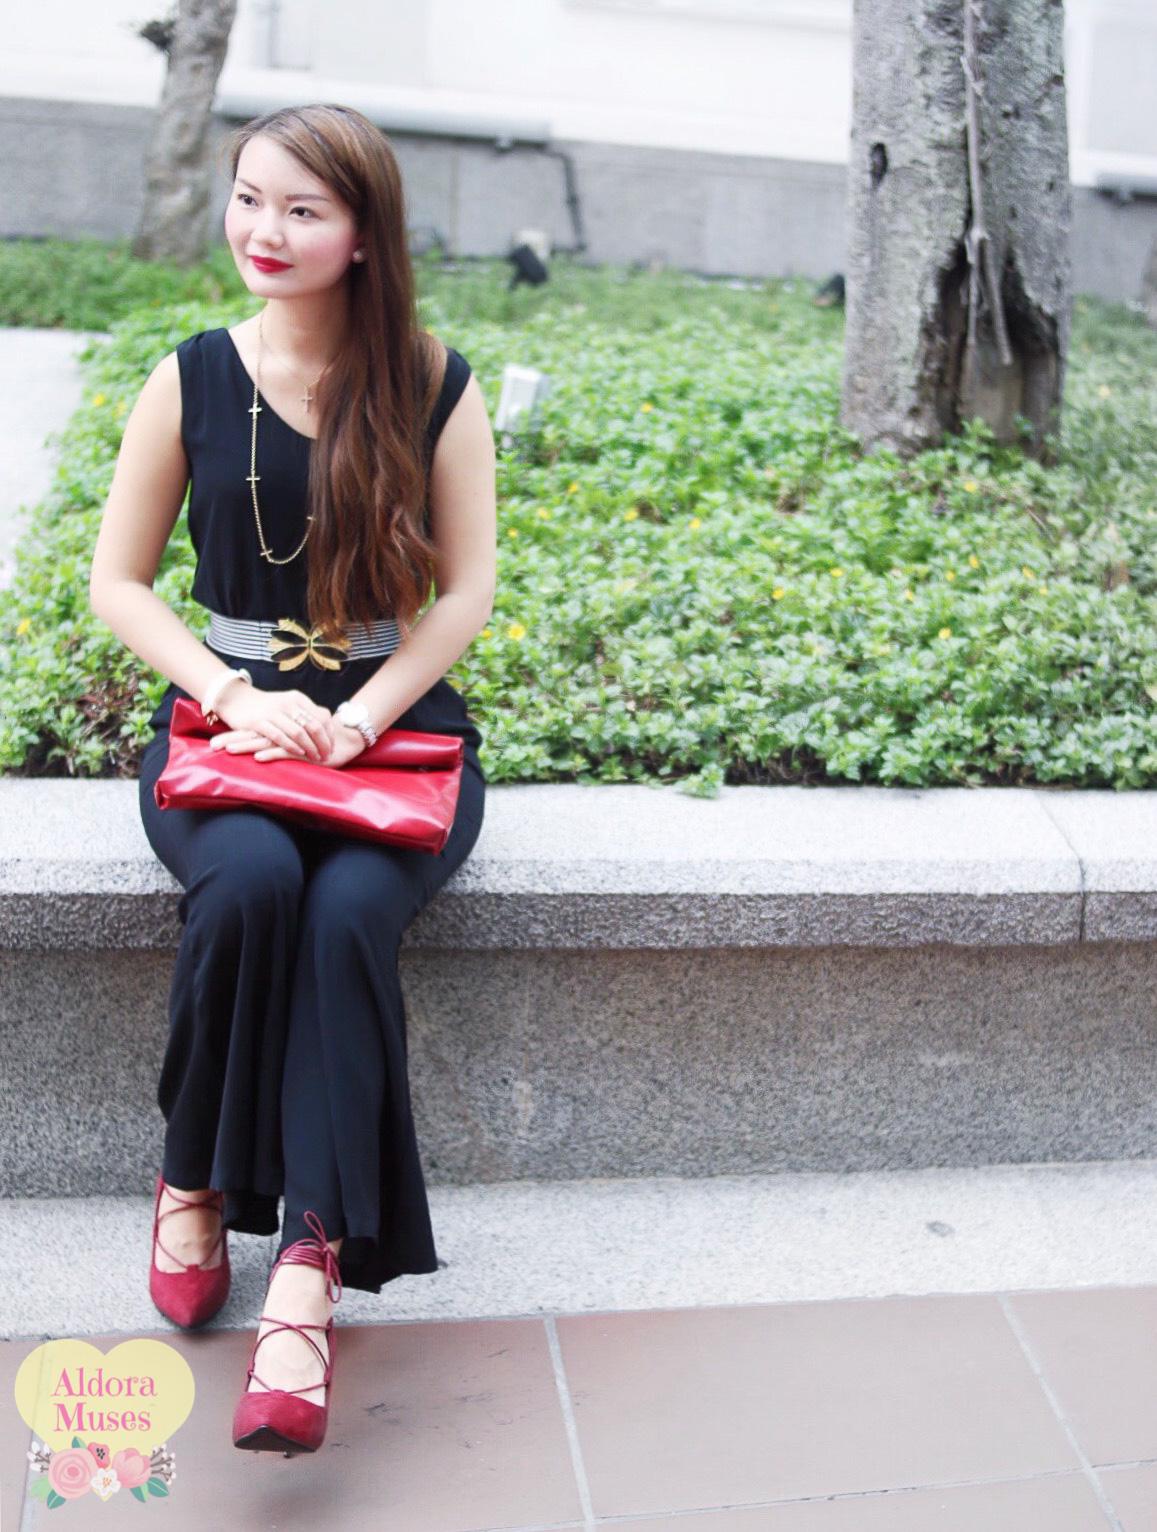 Rebranding My Blog - Aldora Muses